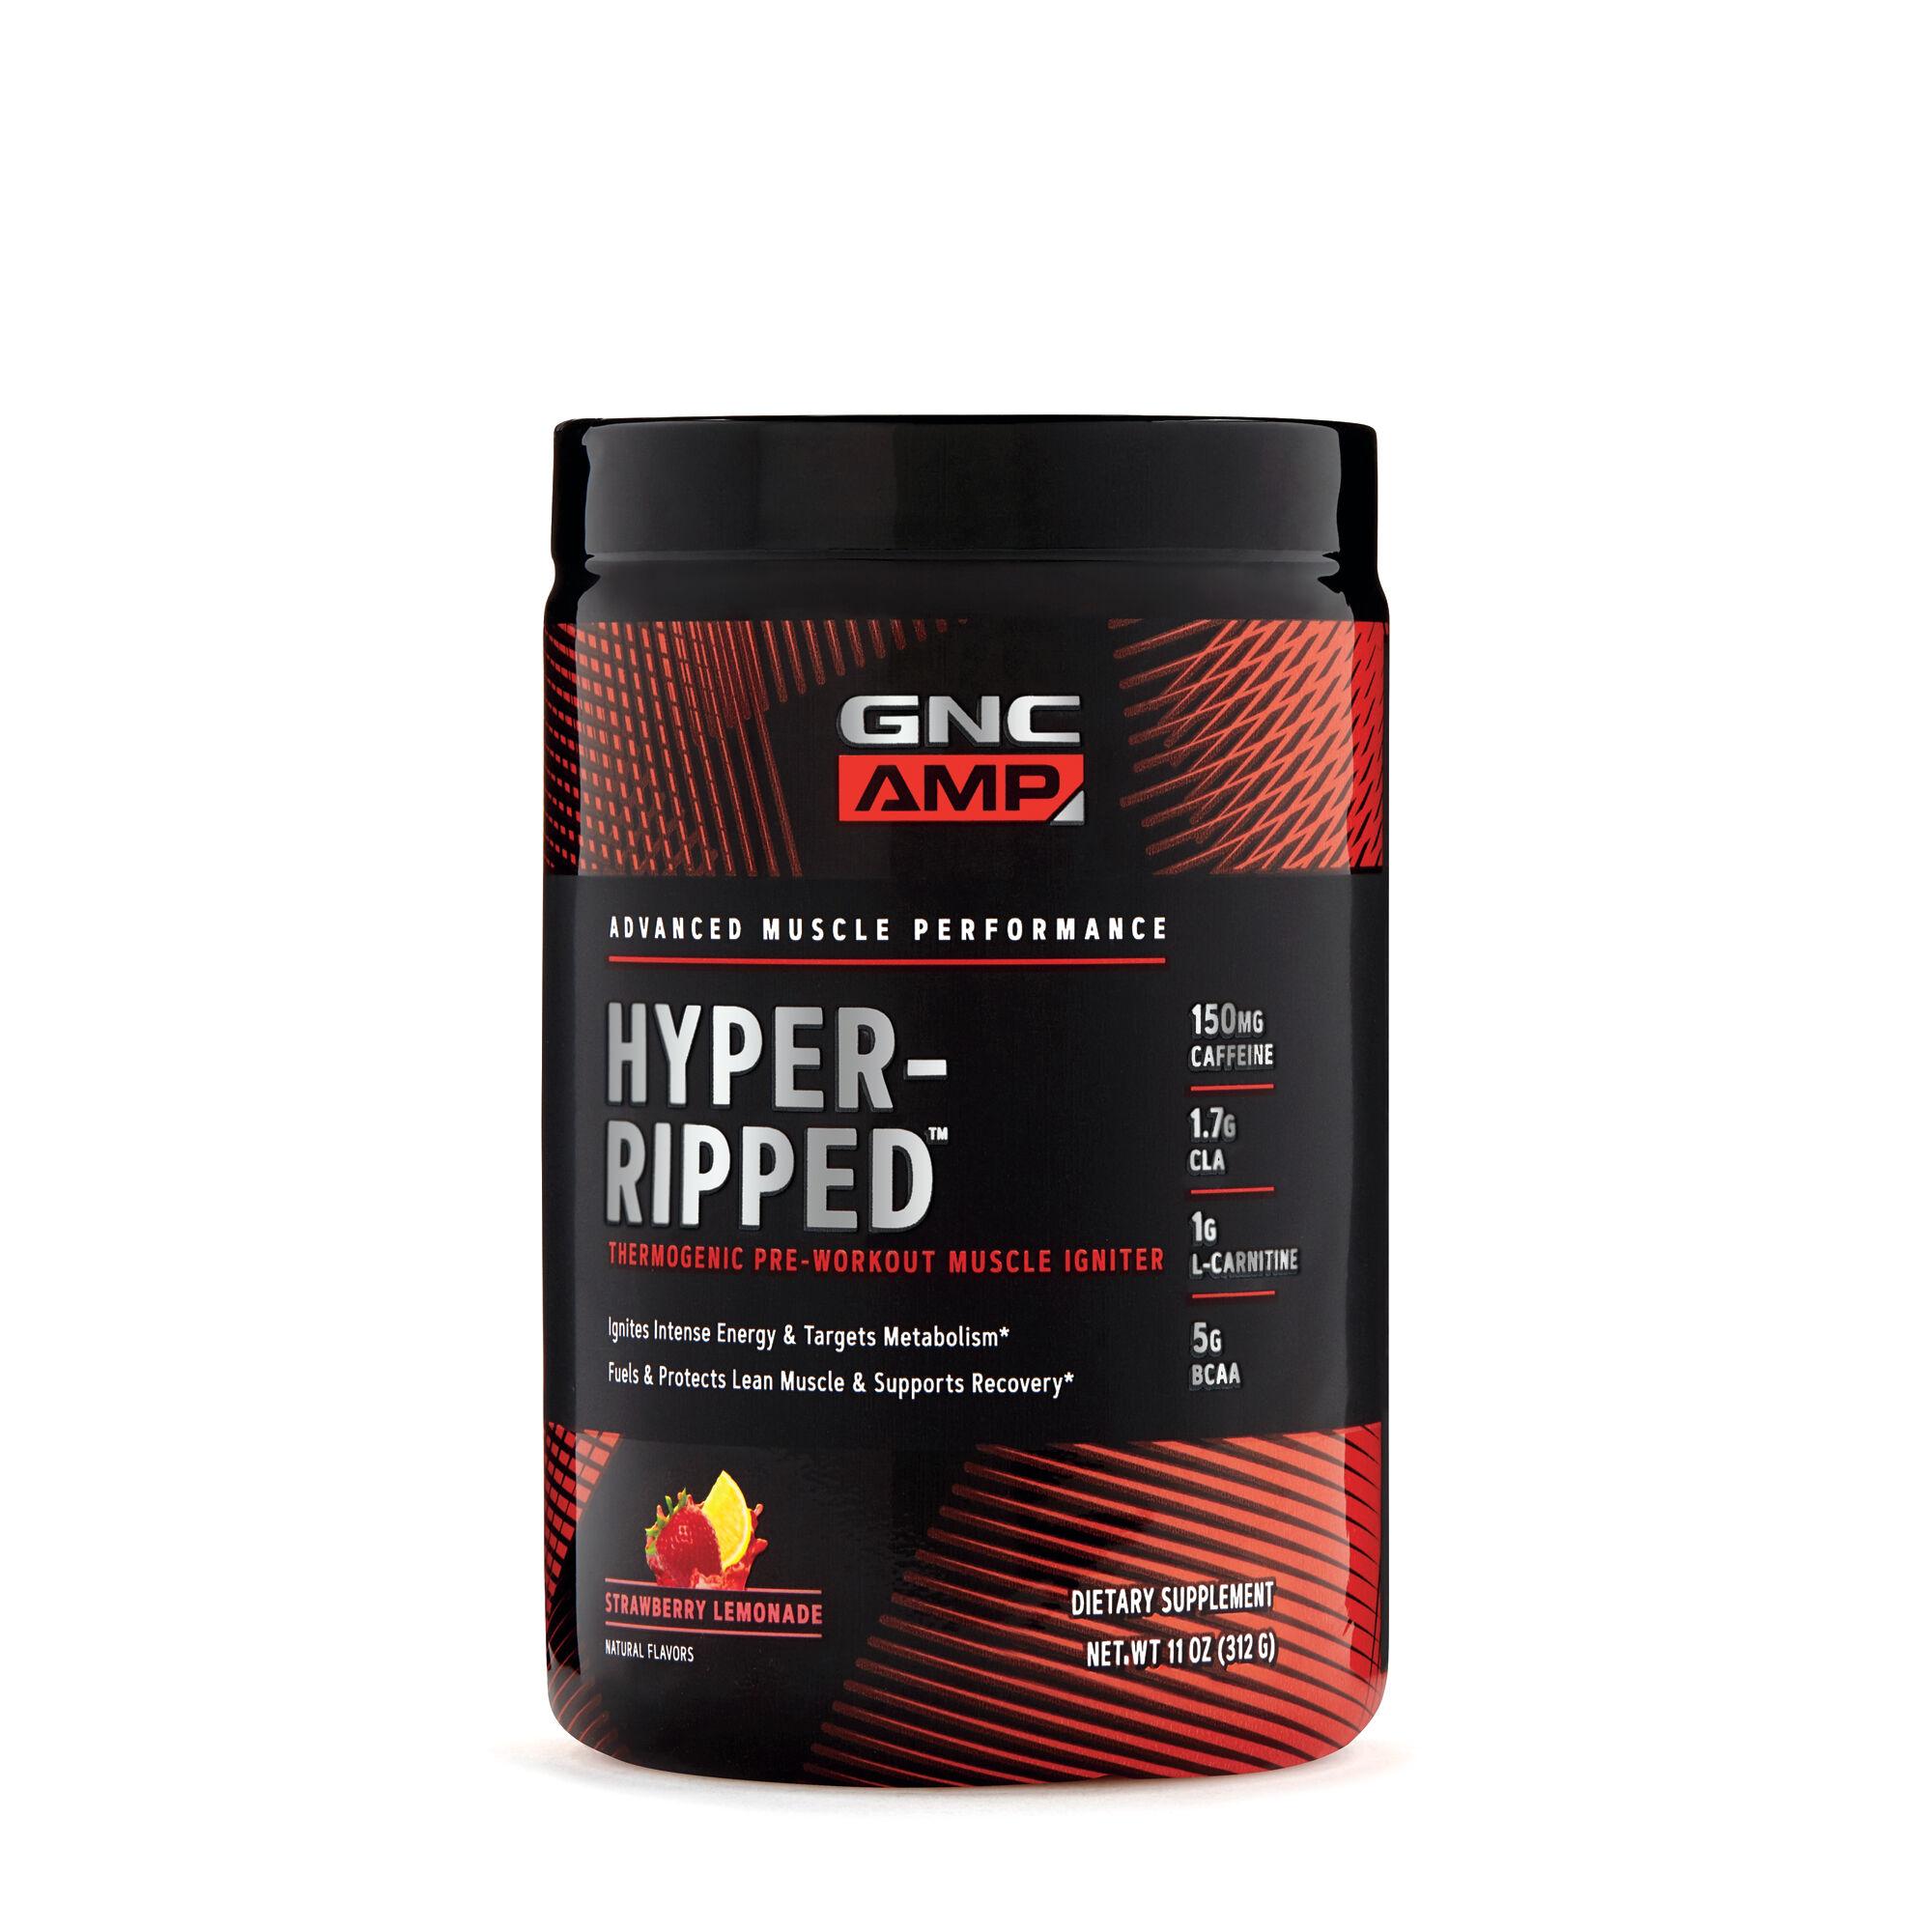 GNC AMP Hyper-Ripped